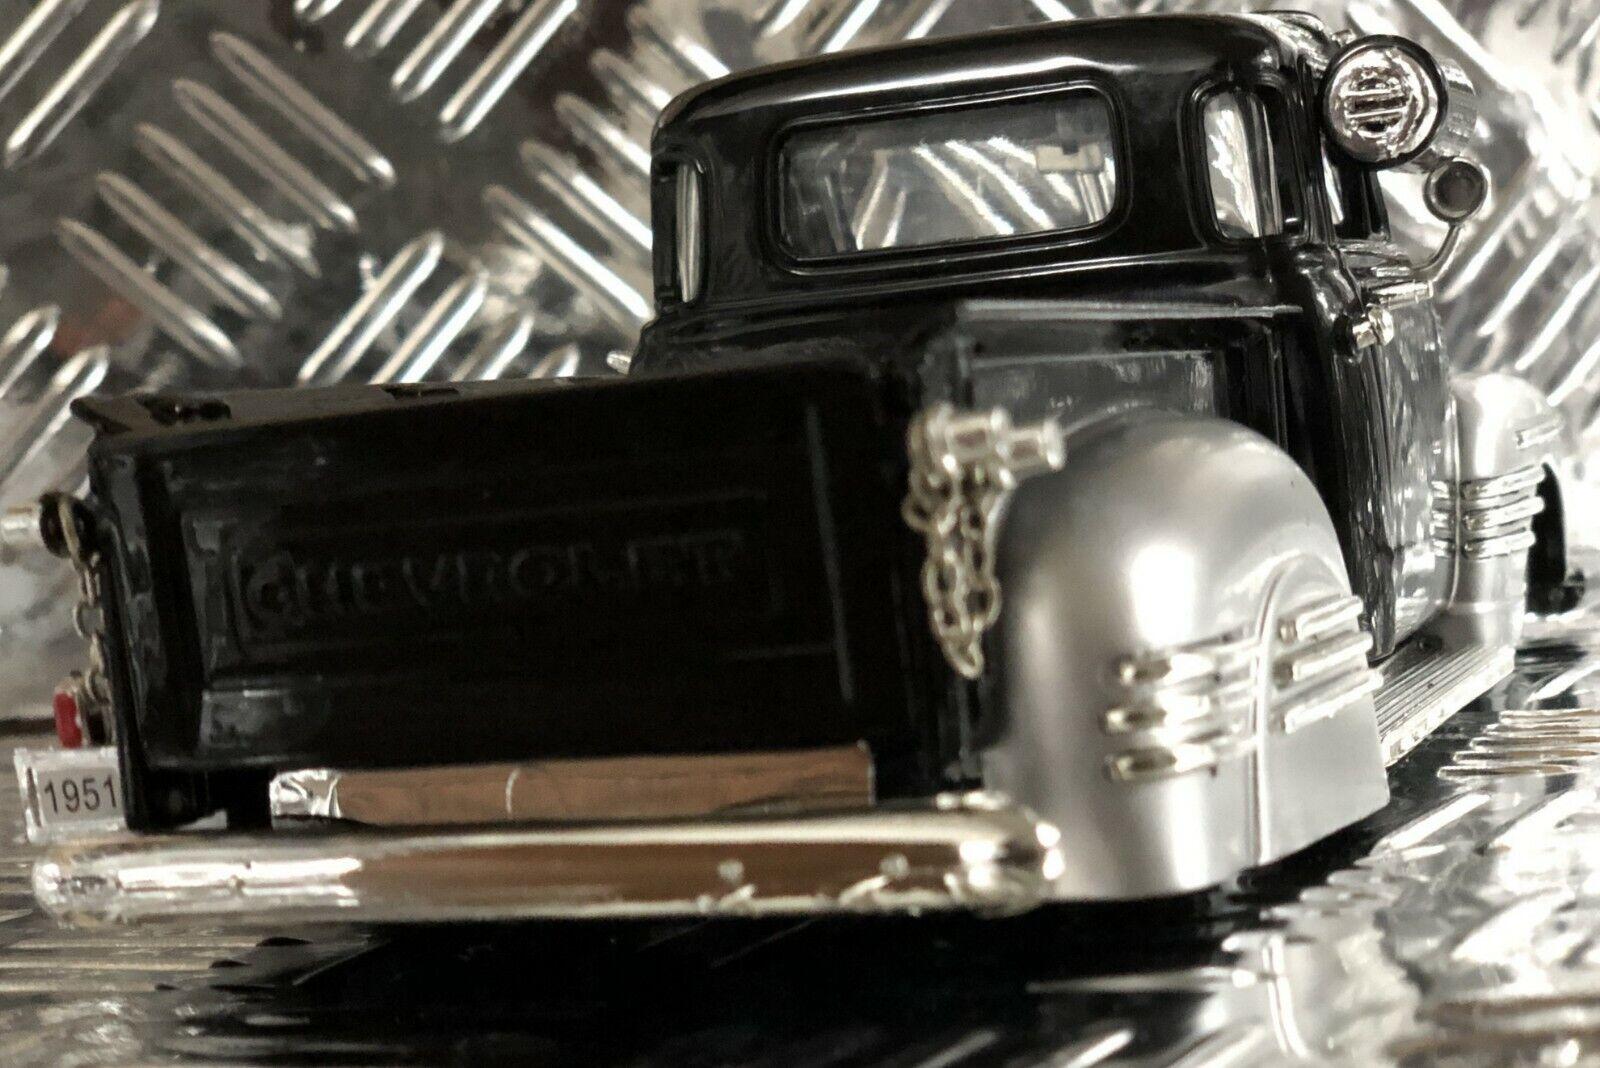 Chevy Camioneta 1950s Vintage Chevrolet Classic 1951 escala 1 24 De Metal Modelo B